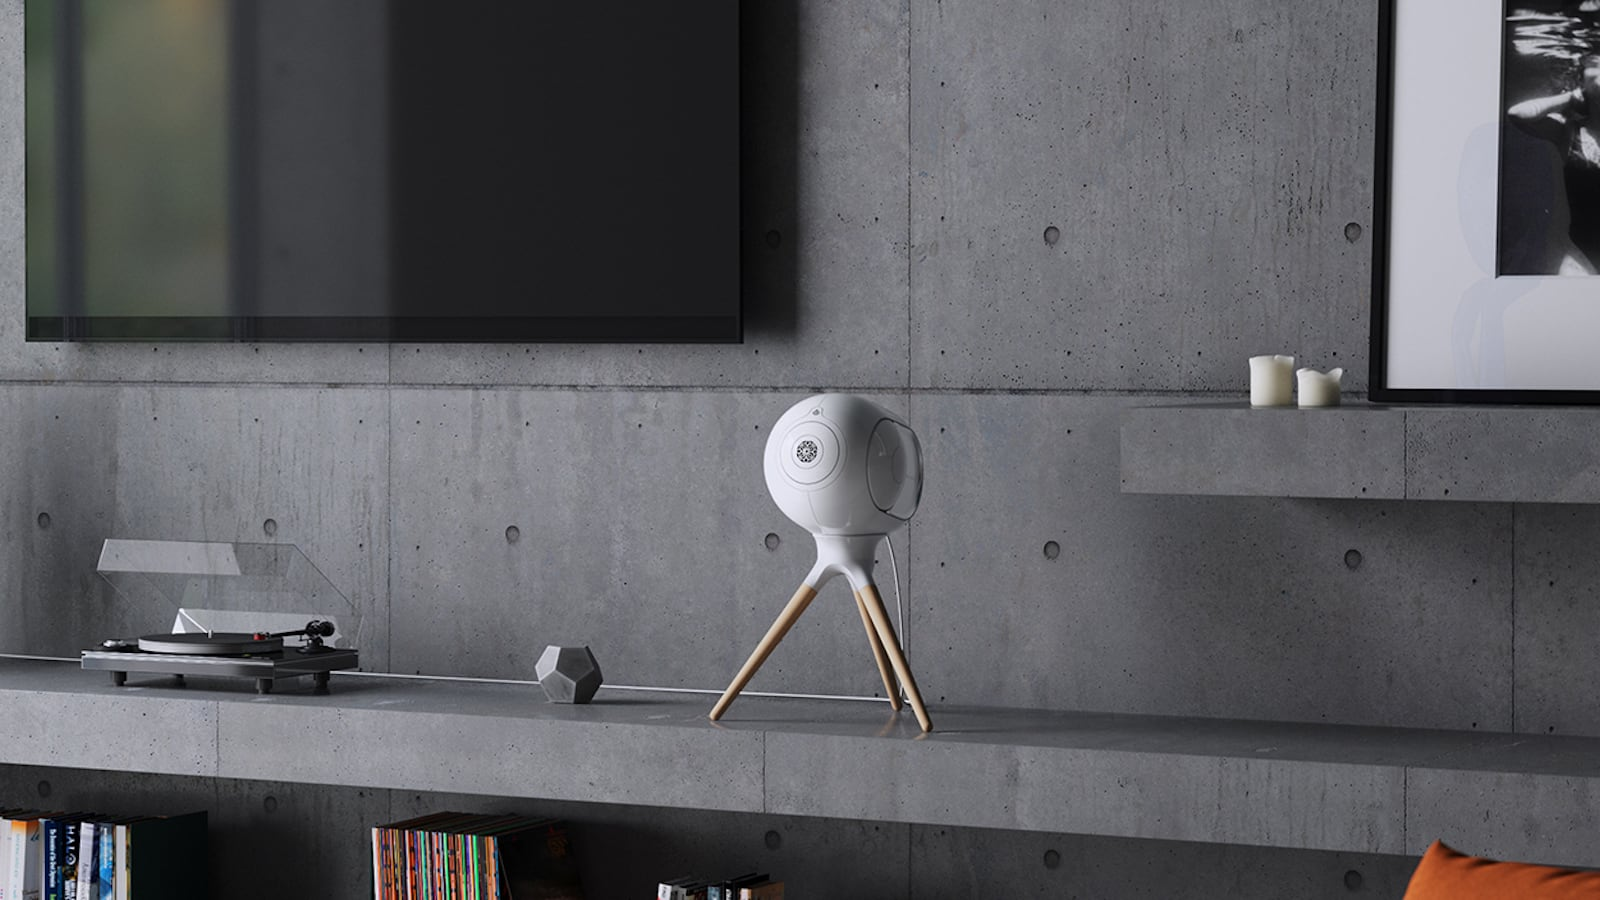 Devialet Classic Phantom 2,000-Watt Speaker delivers gorgeous high-fidelity sound